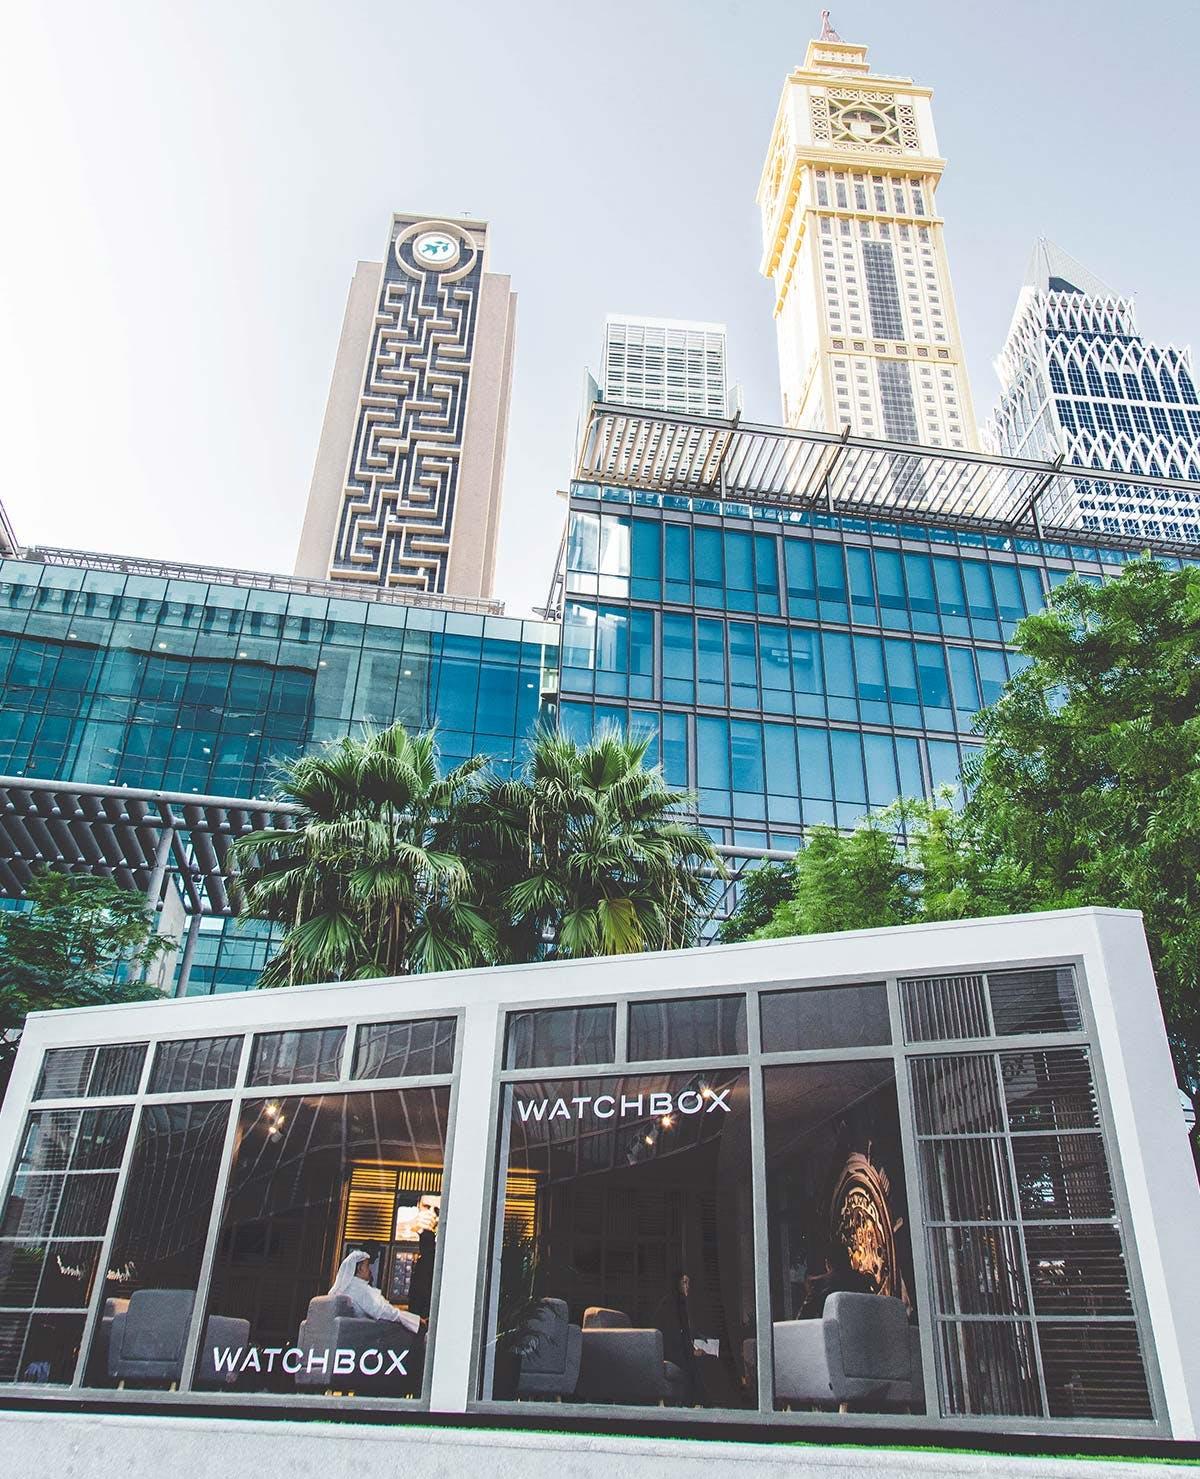 Dubai pop-up shop